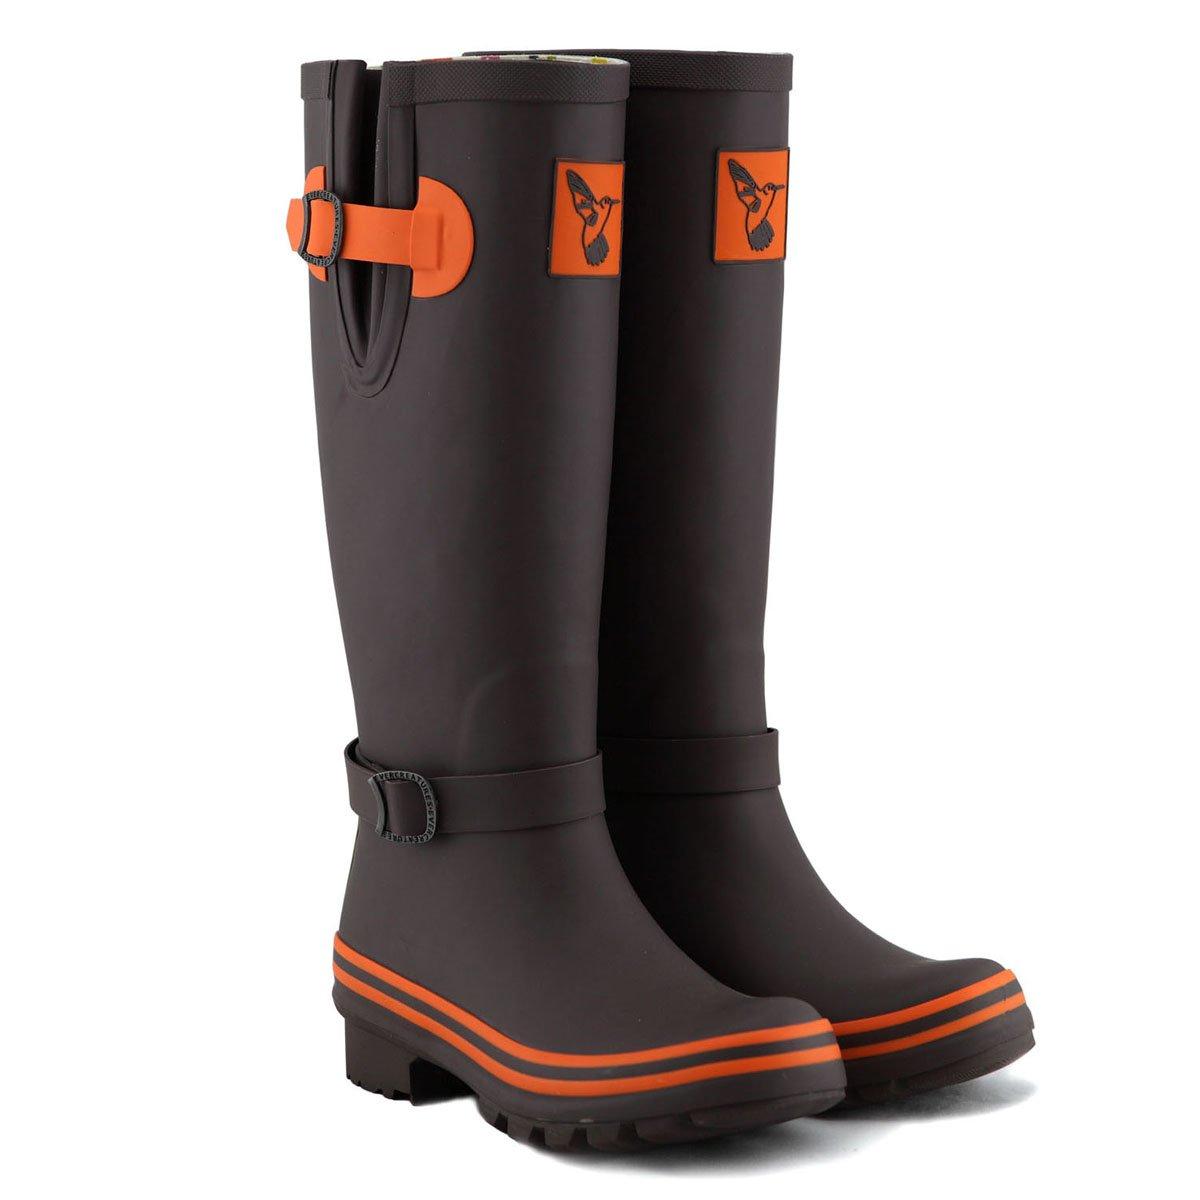 Evercreatures Women's Rain Boots UK Brand Original Tall Rain Boot Gumboots Wellies B00AUE8TPE 9 B(M) US / UK7 / EU40|Brown